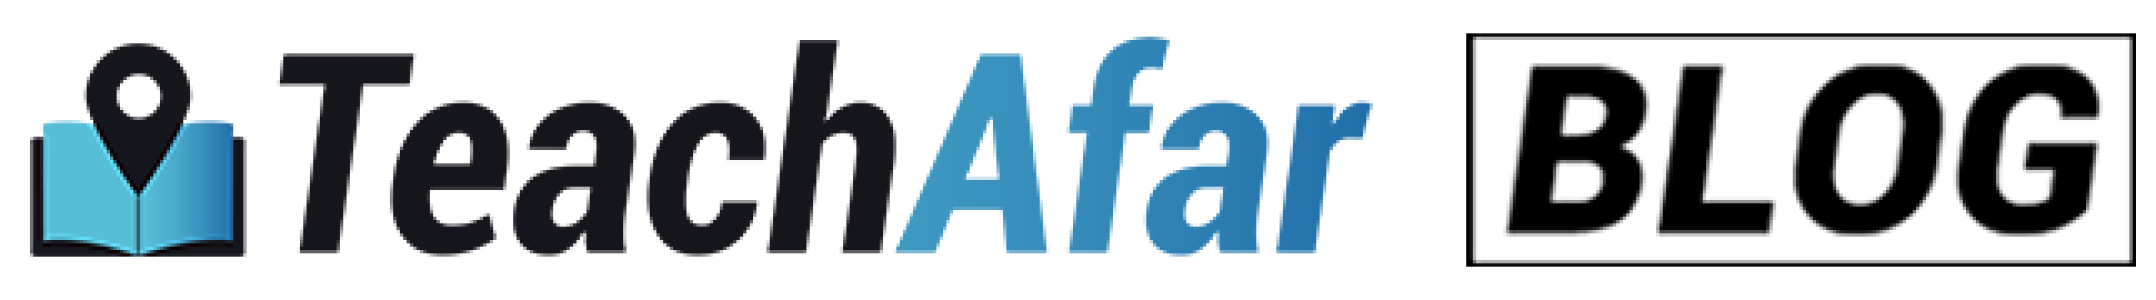 TeachAfar Blog